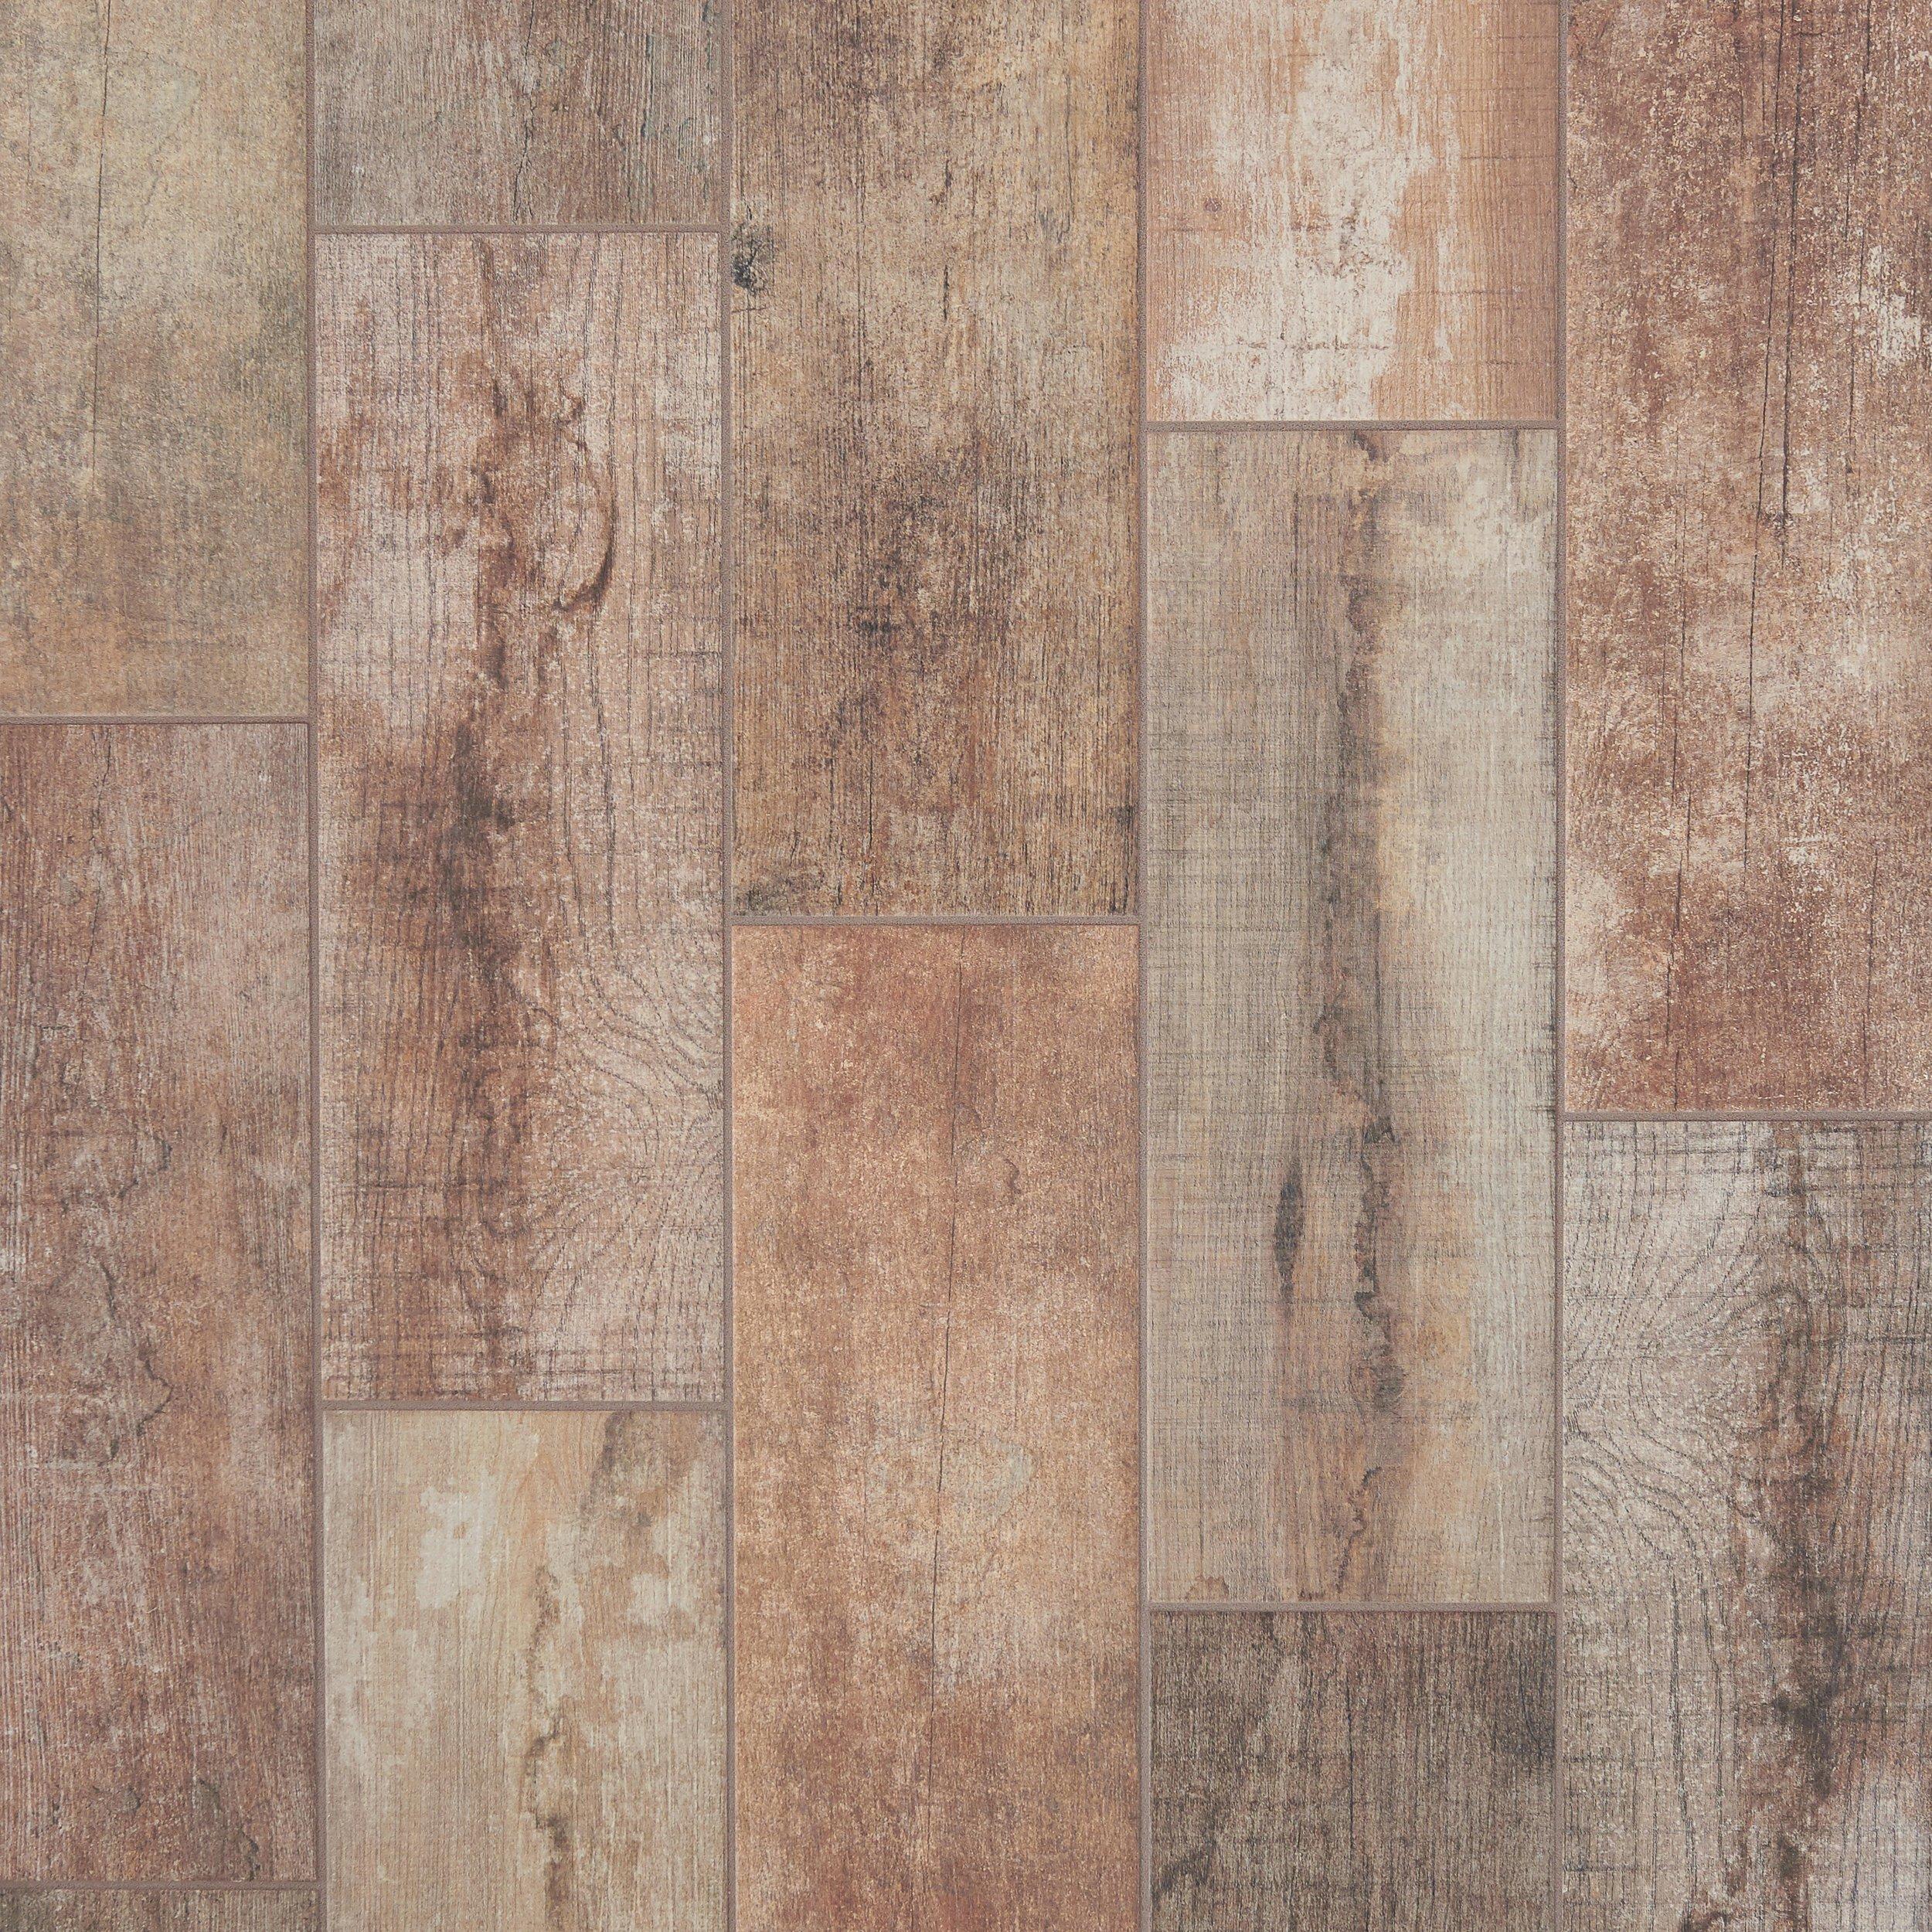 tile floor fence ceramic appealing wooden flooring simple for tilekitchen tiles kitchen ideas design